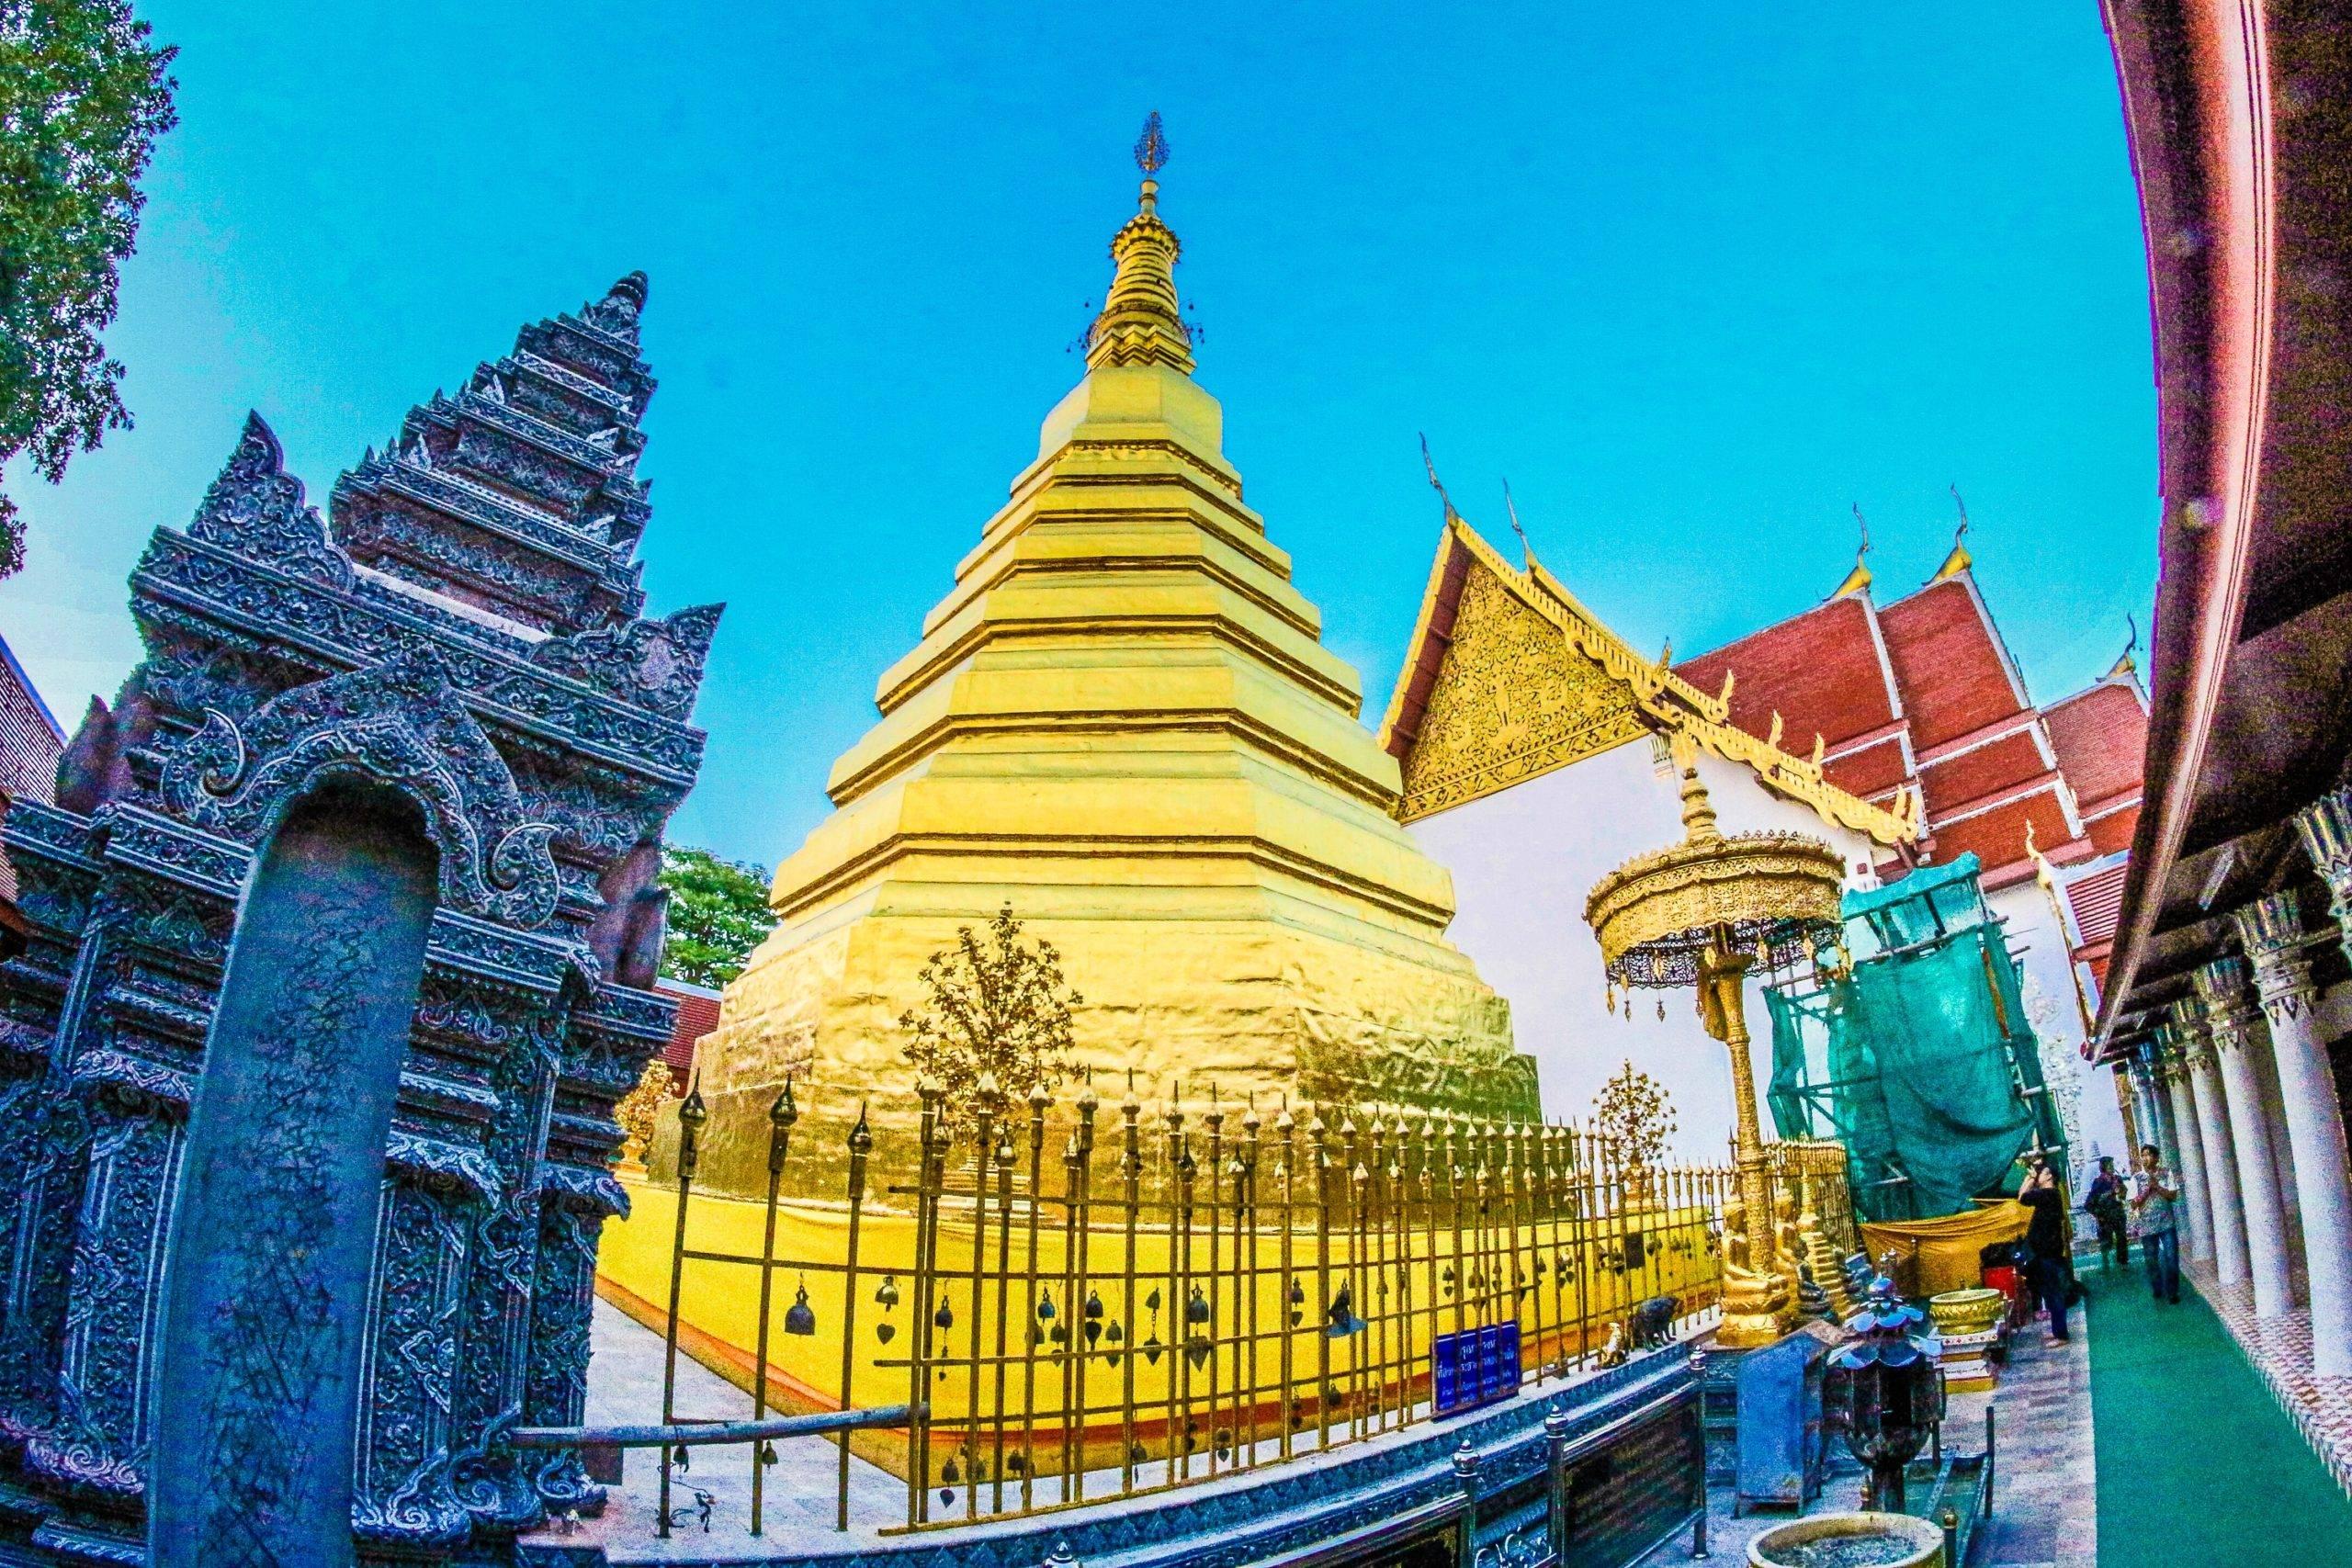 Goldene Tage in Asien